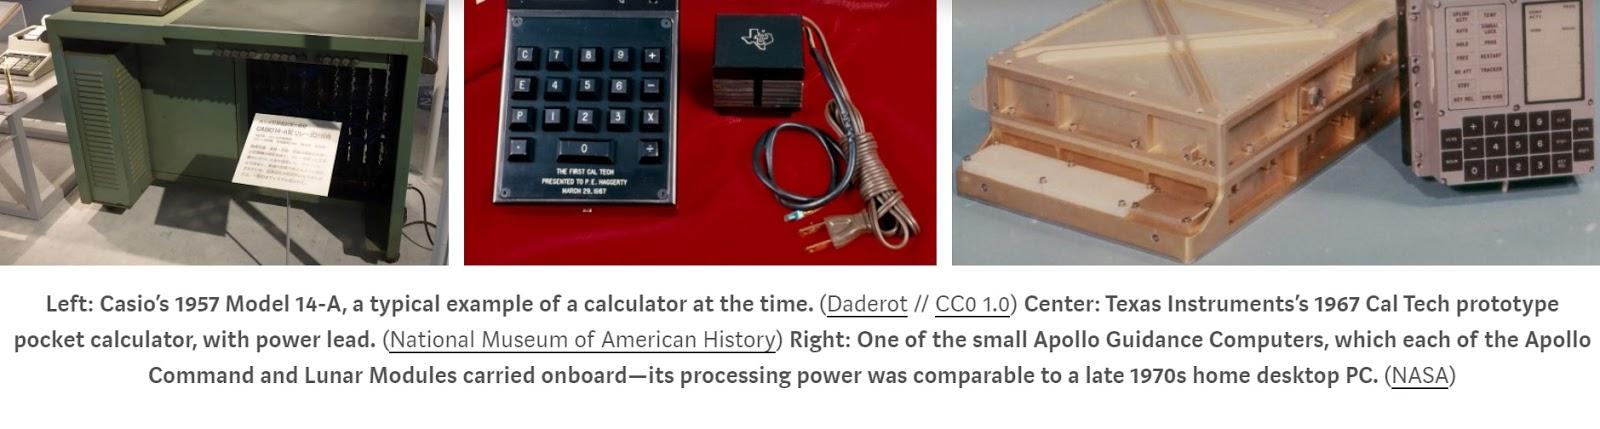 Meet Your Smartphone's Grandparent: Pocket Calculator / Digital